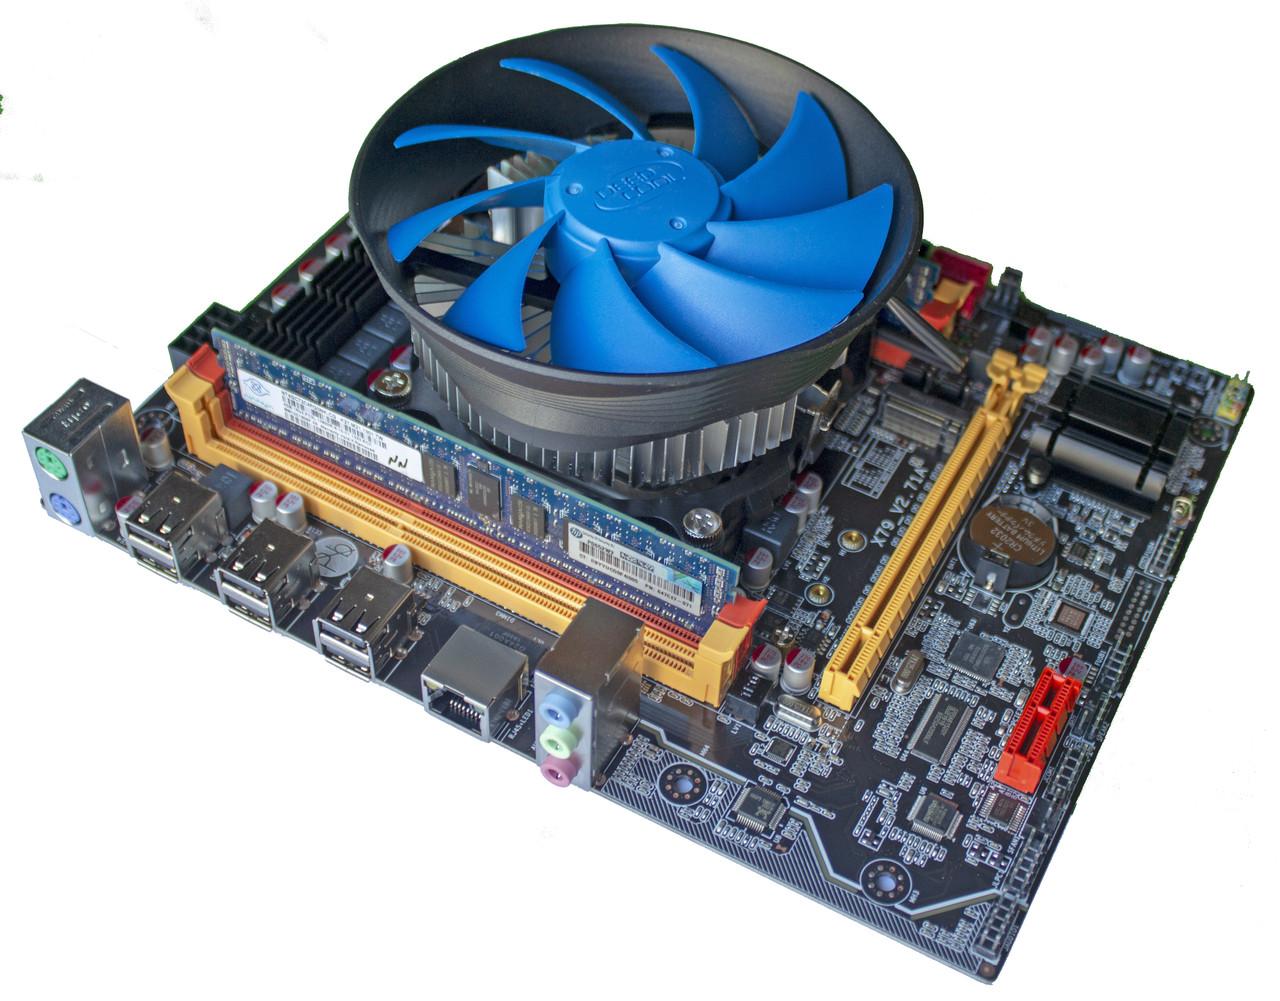 Комплект X79 2.71A + Xeon E5-2630 + 8 GB RAM + Кулер, LGA 2011